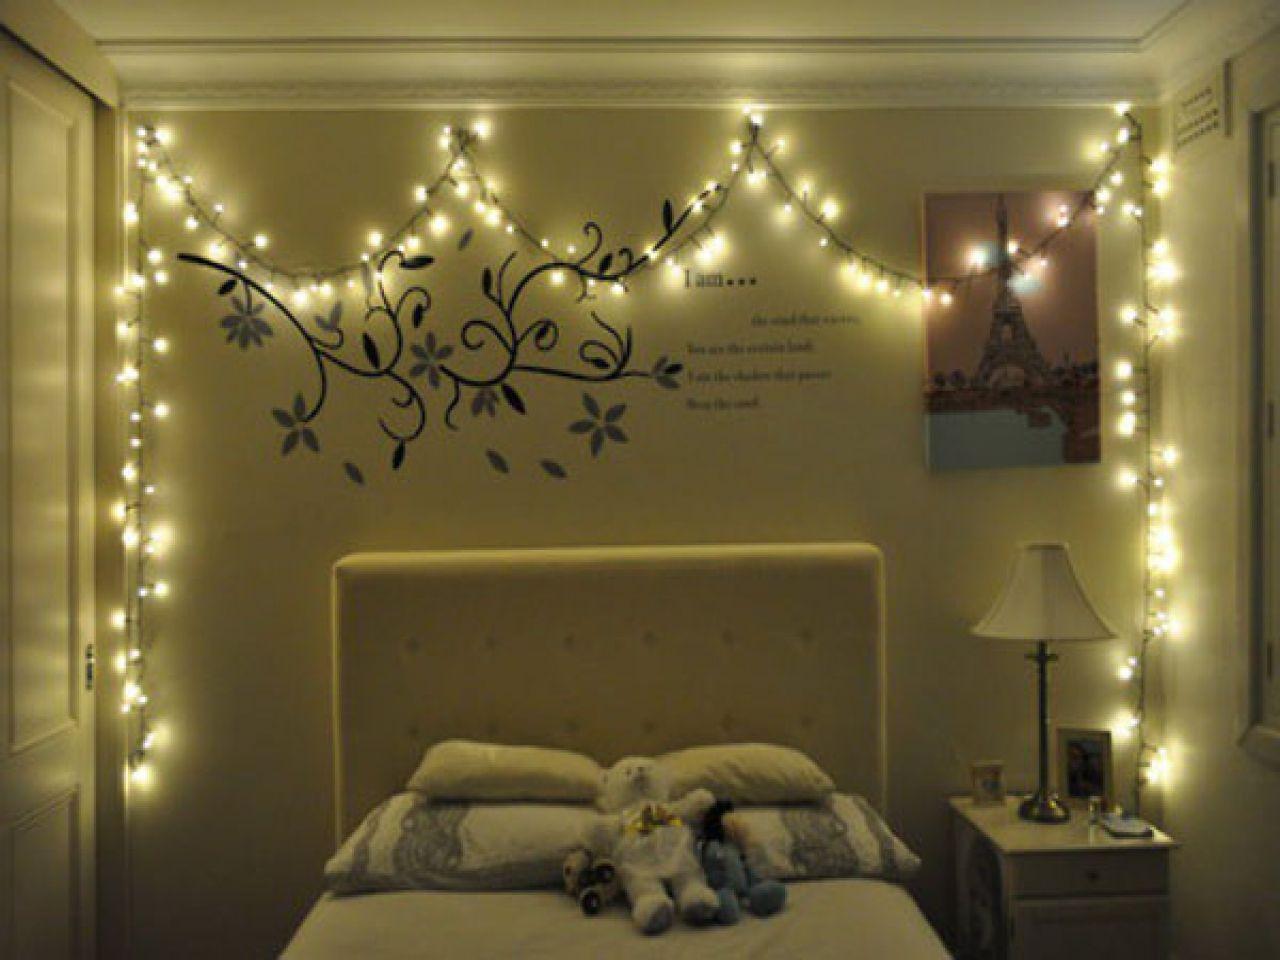 Christmas Light Decorations Bedroom Decorating Ideas Room In 2020 Christmas Lights In Bedroom Christmas Lights In Room Bedroom Decor Lights